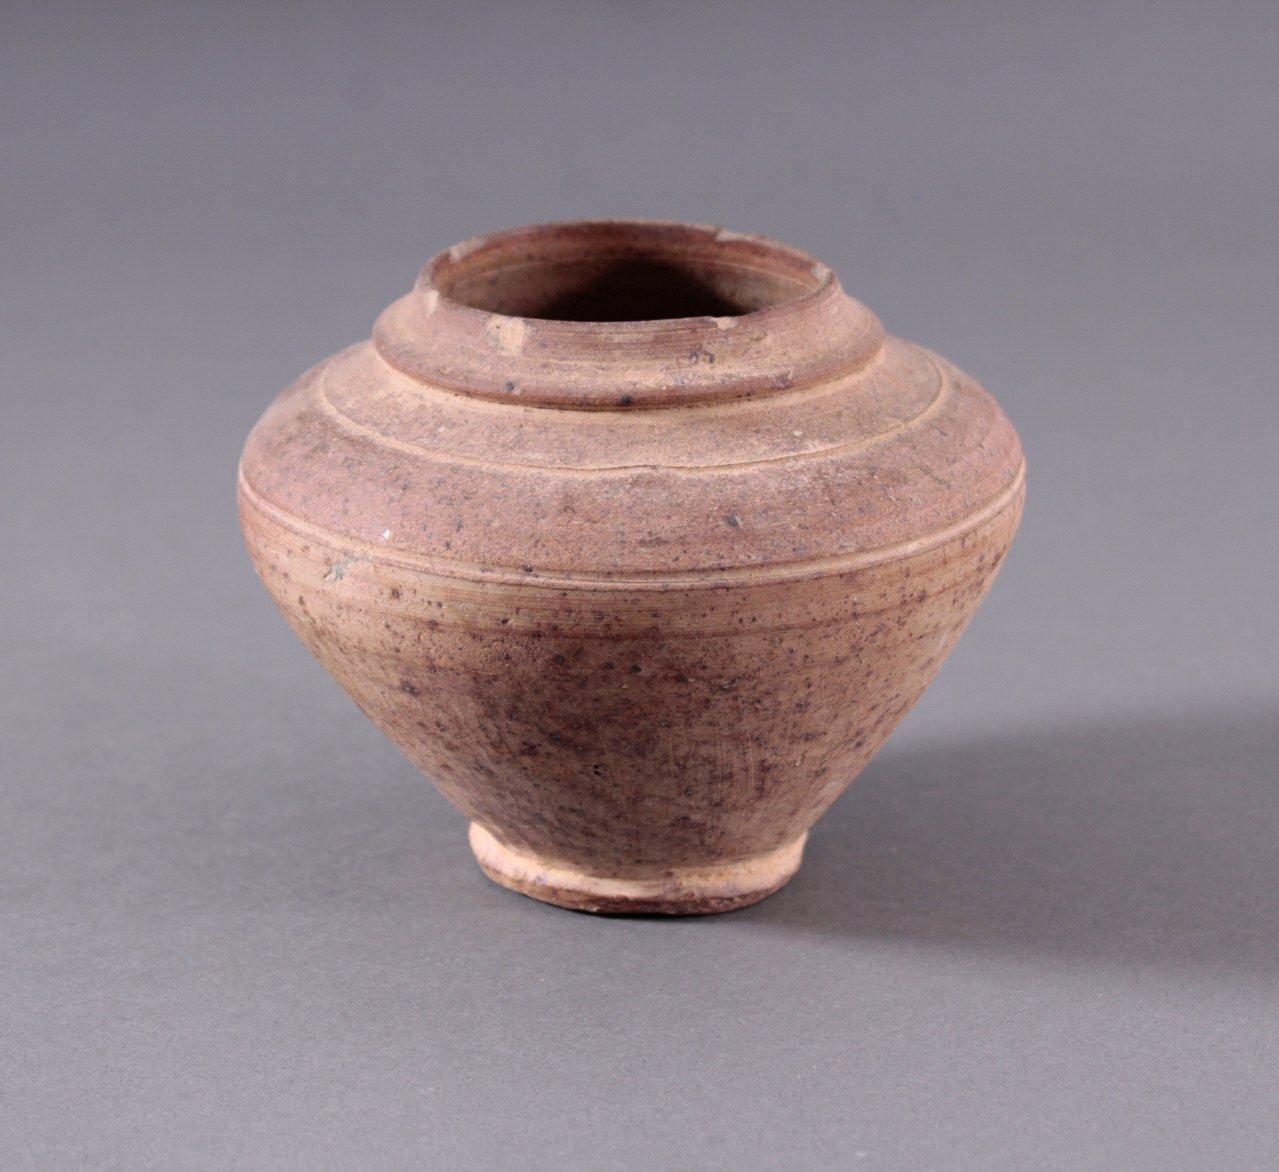 Vorratsgefäß, Ankor-Periode 12./13. Jahrhundert, Kambodscha